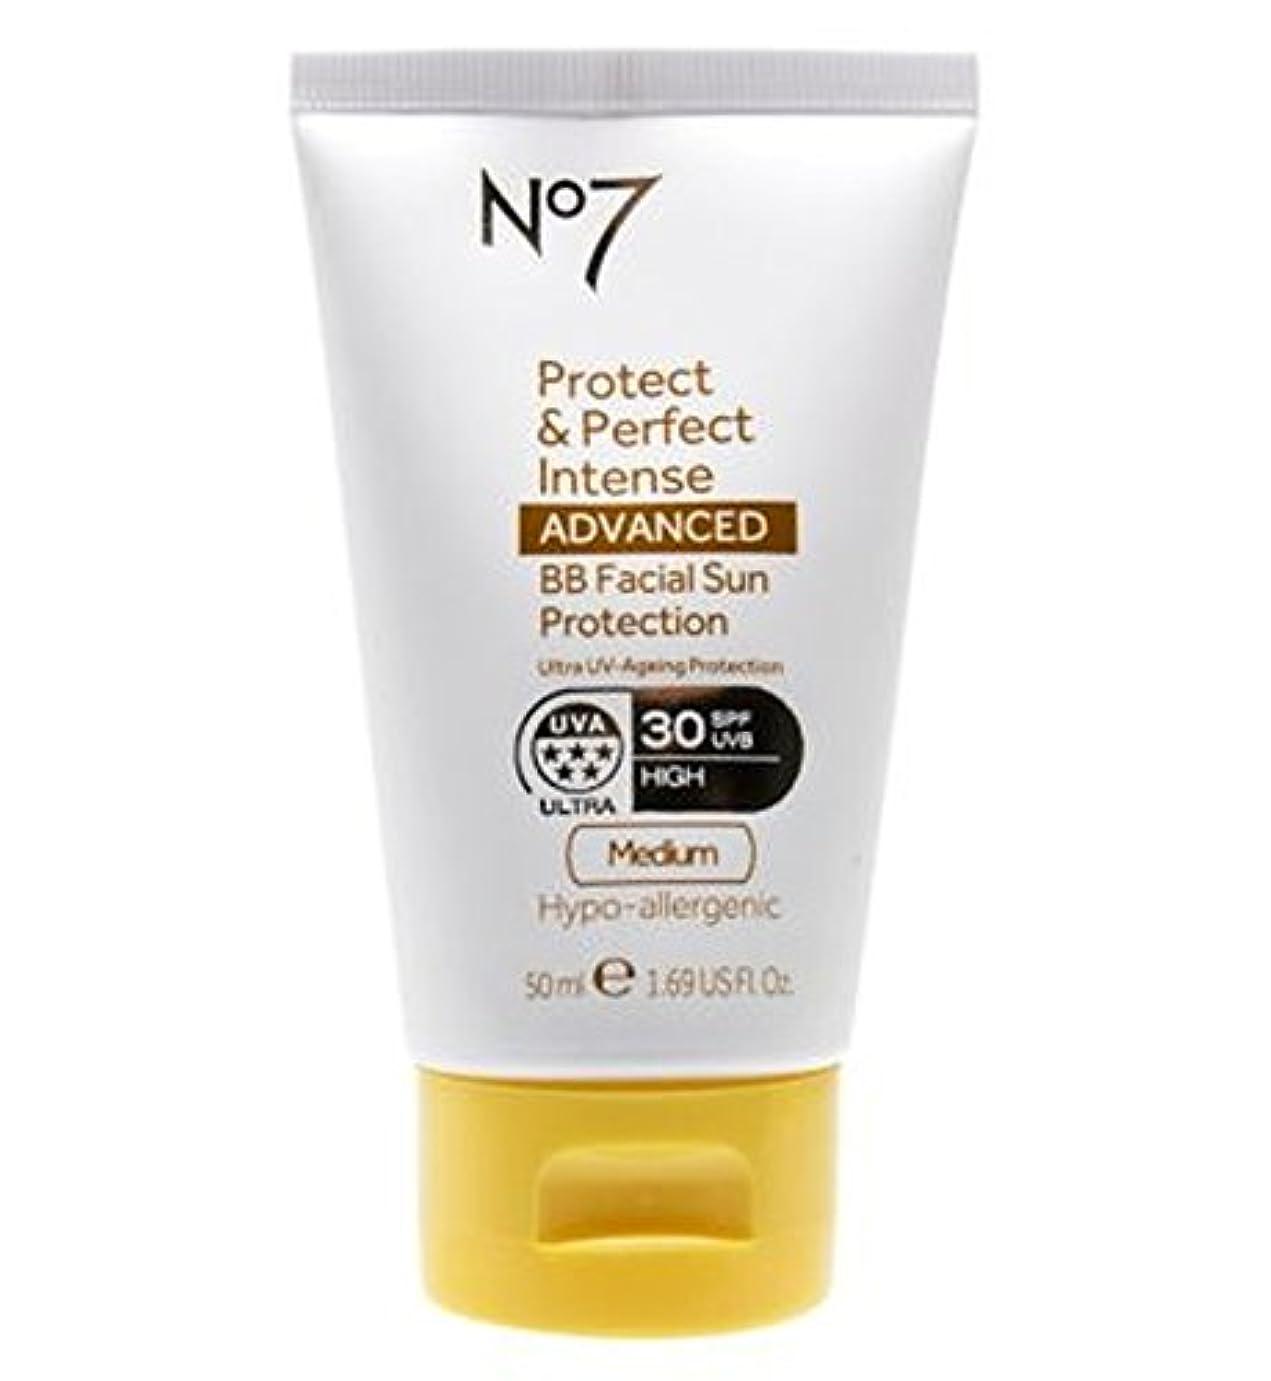 No7保護&完璧な強烈な先進Bb顔の日焼け防止Spf30培地50ミリリットル (No7) (x2) - No7 Protect & Perfect Intense ADVANCED BB Facial Sun Protection...